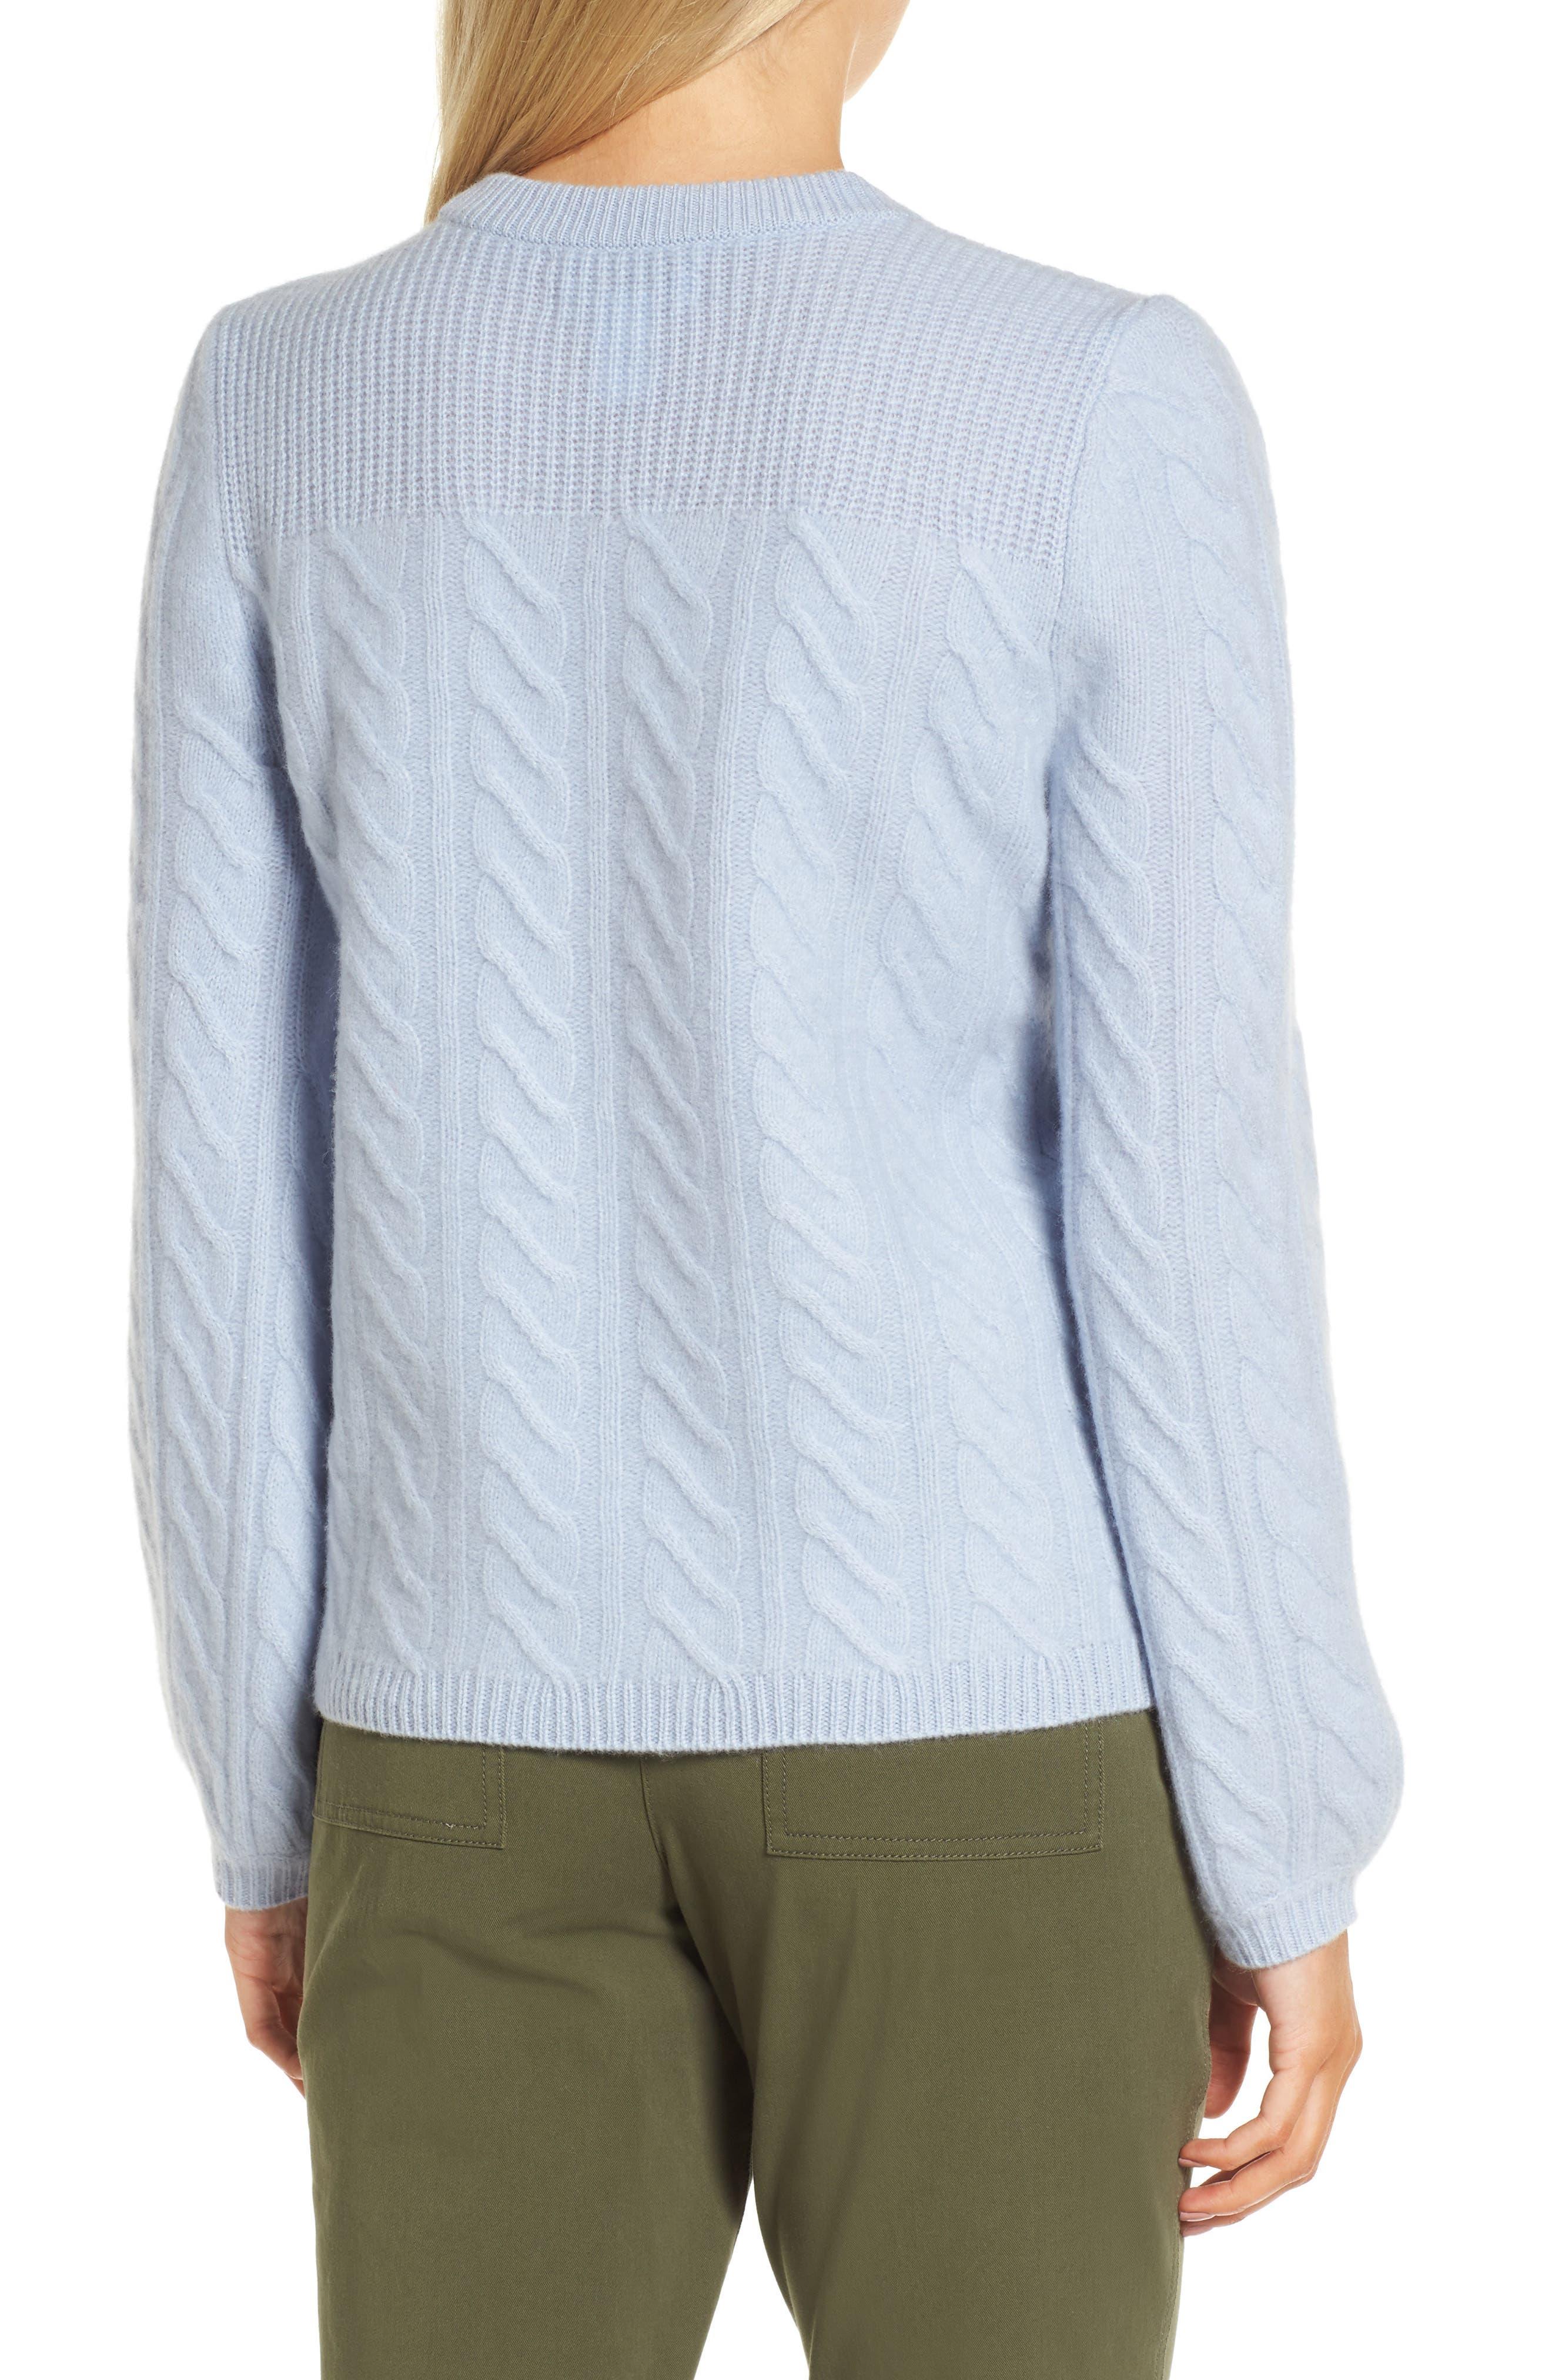 Alternate Image 2  - Nordstrom Signature Cable Cashmere Sweater